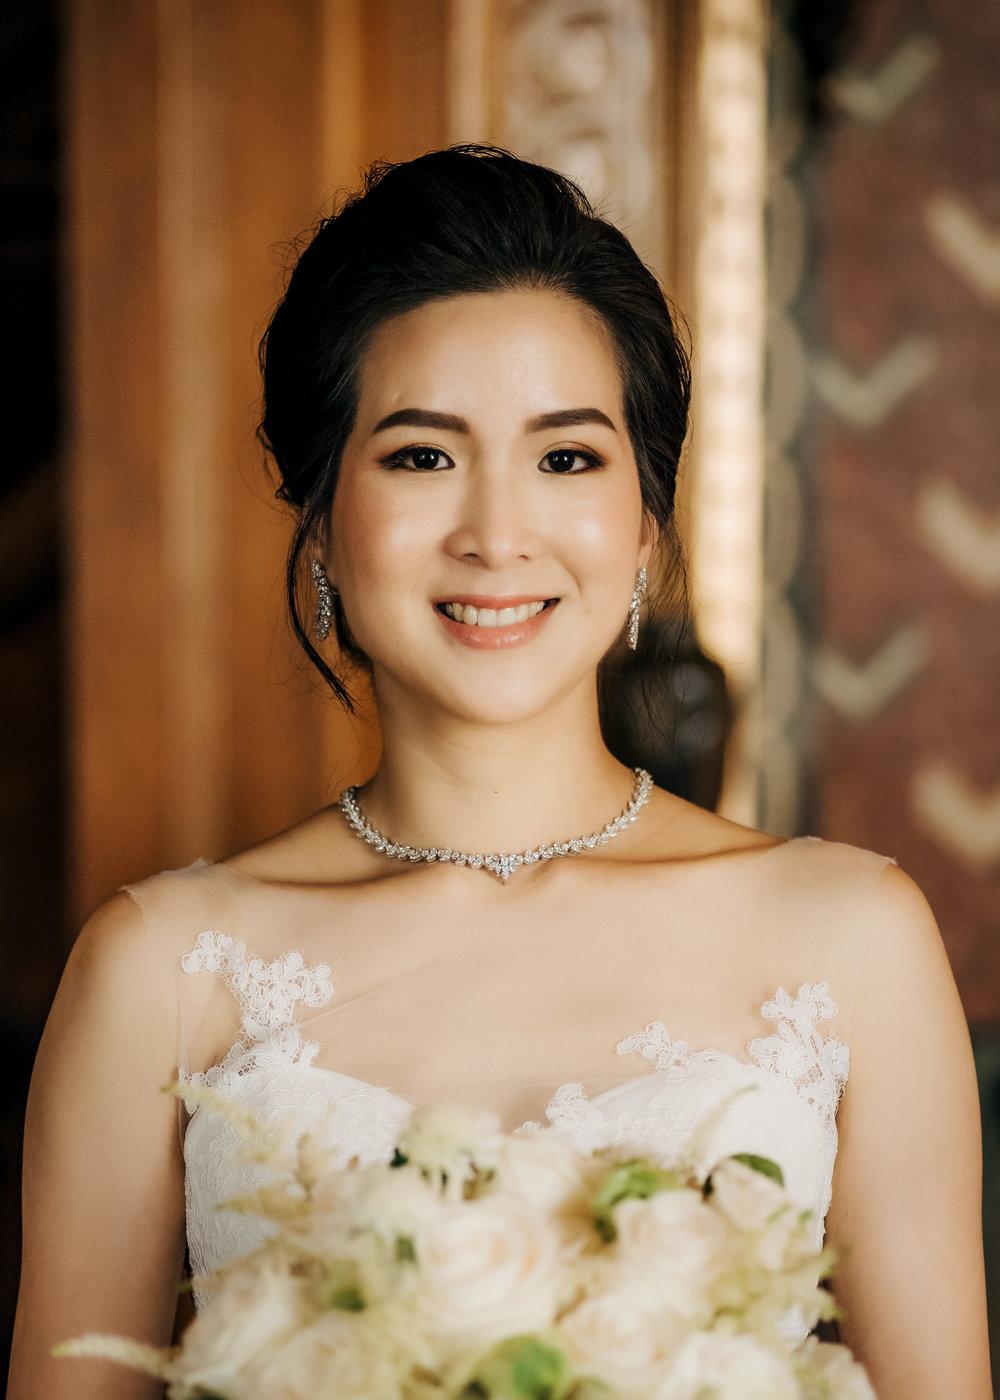 Turchin_20181014_Prim-Jacky-Wedding_122.jpg